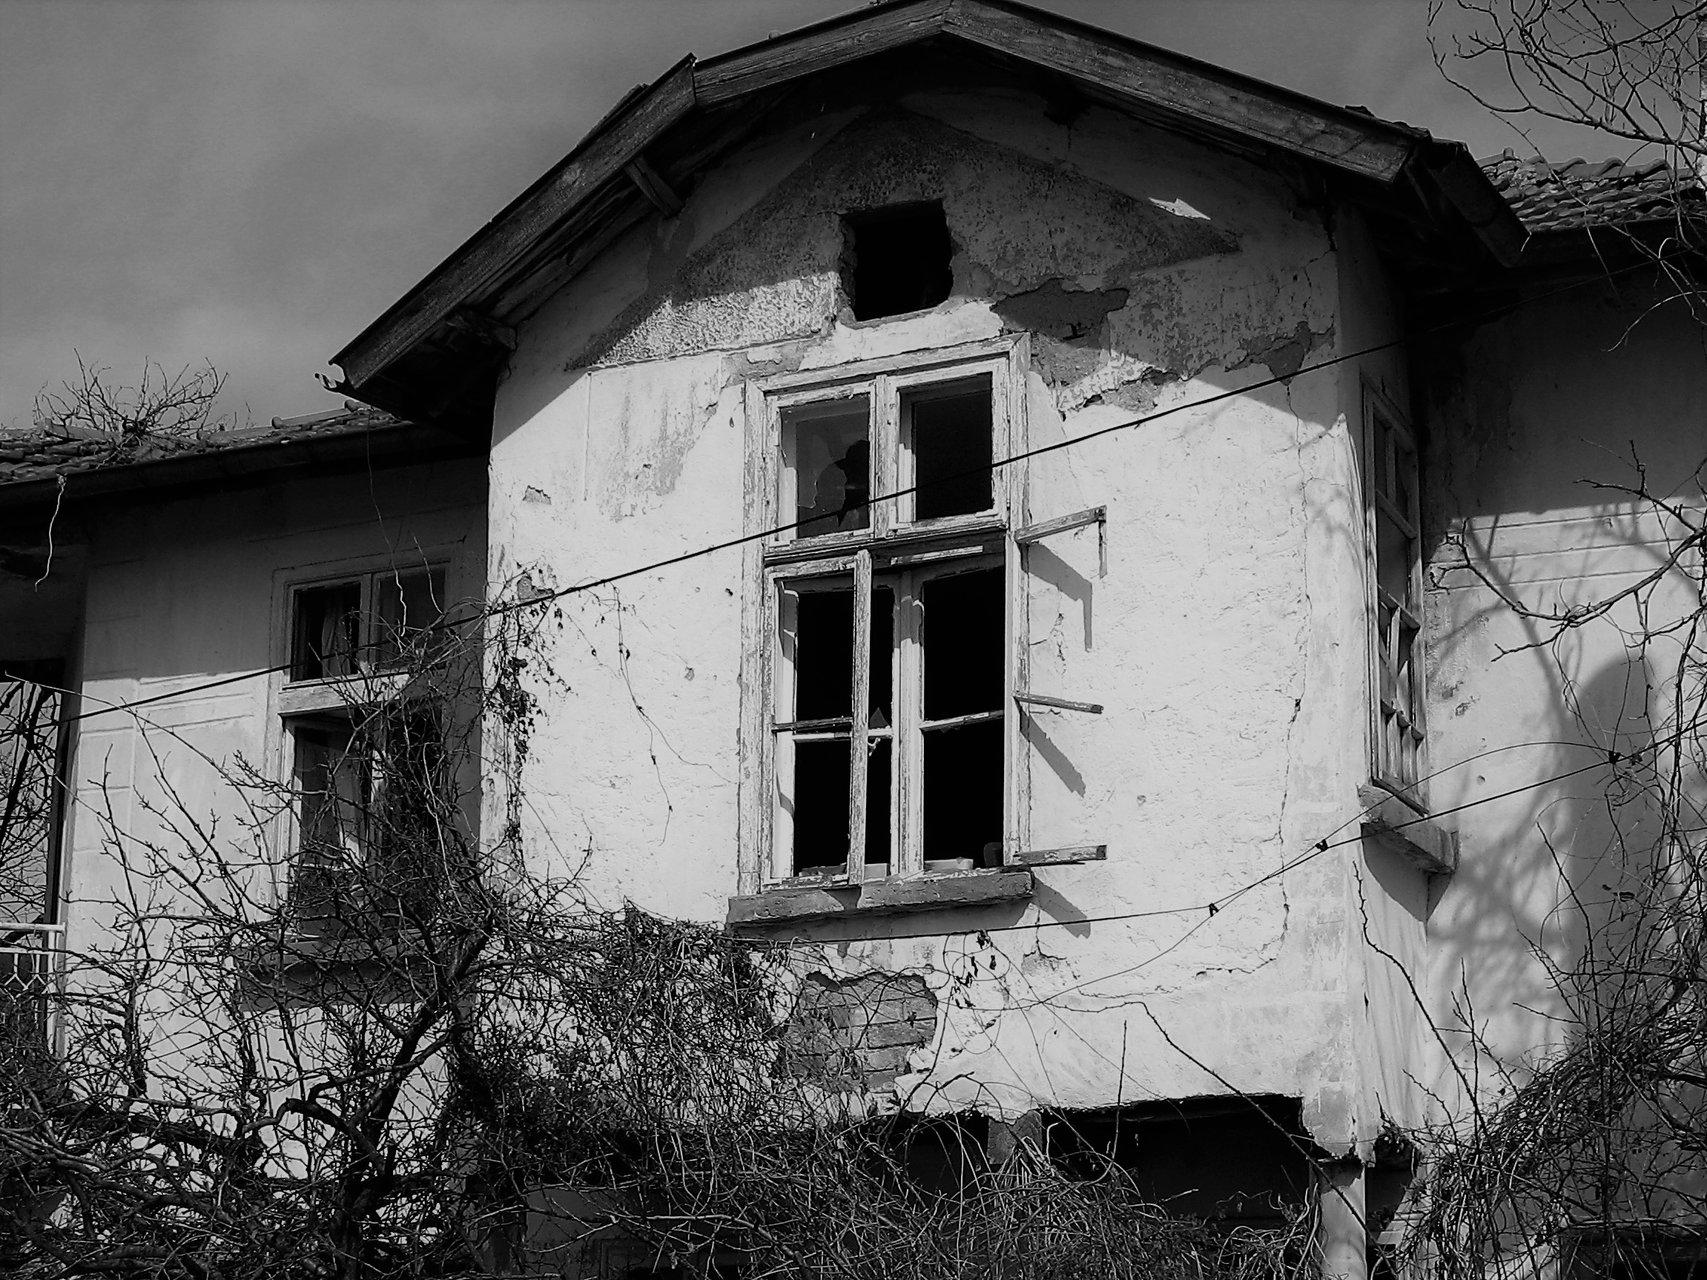 тъжно   Author stefan vladimirov - glika   PHOTO FORUM